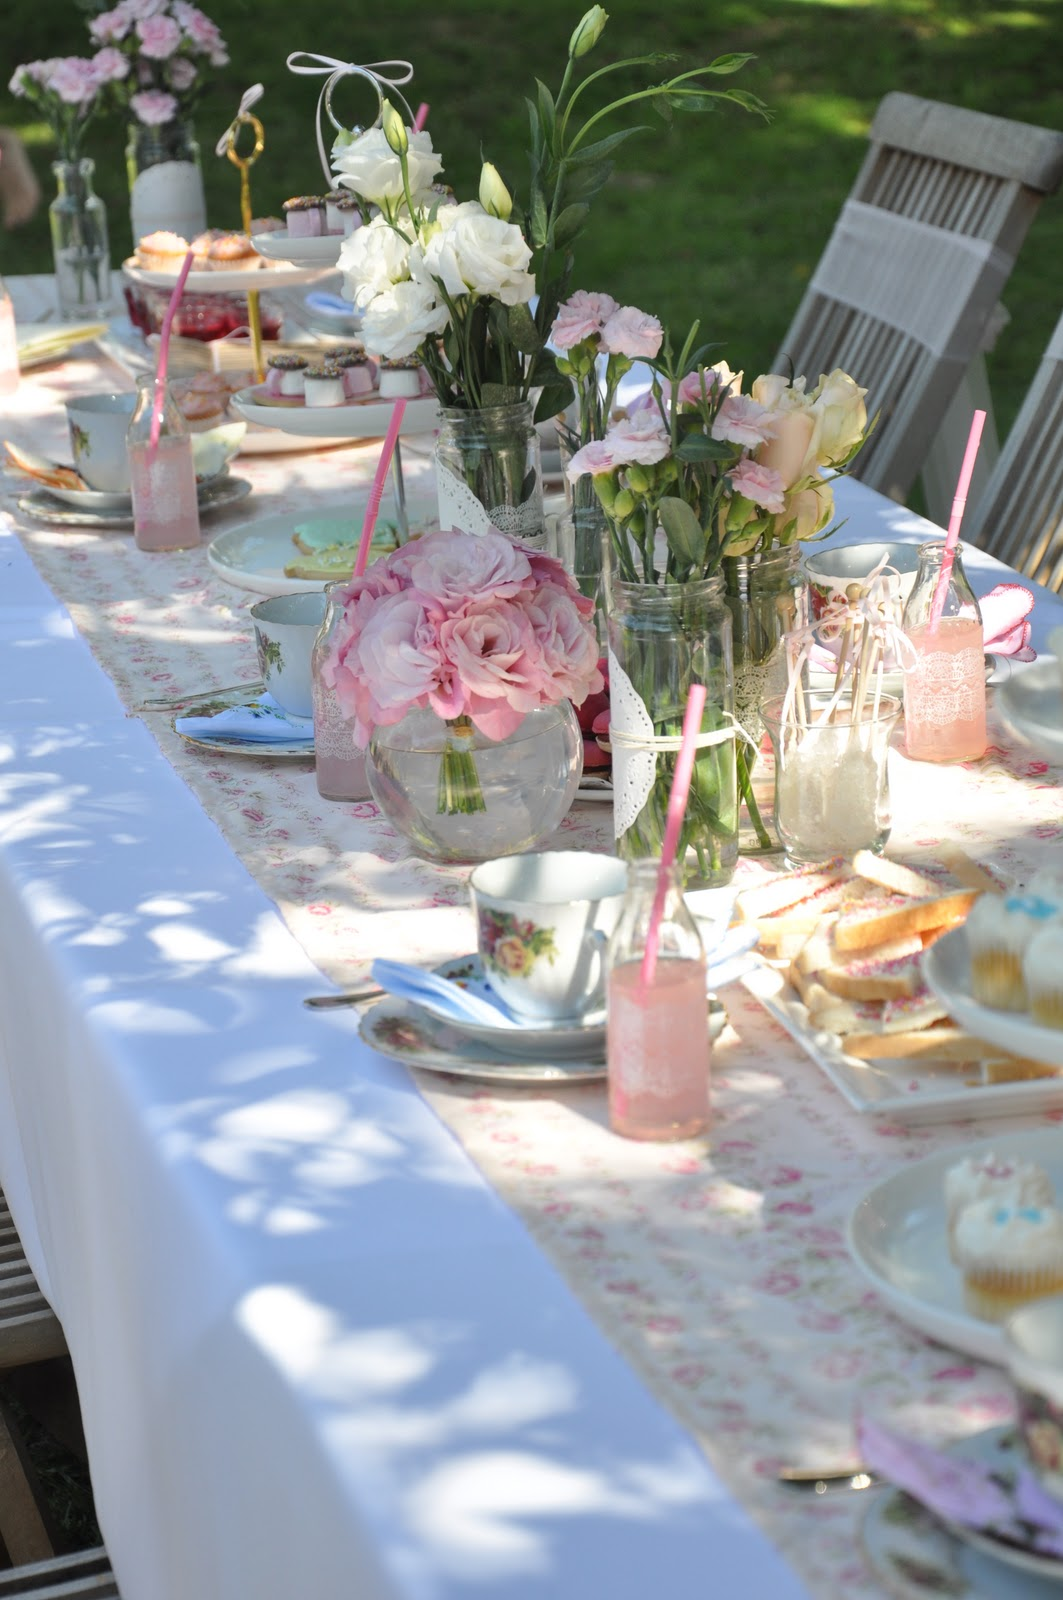 The vintage garden tea party asian wedding ideas summer for Decoracion bautizo en jardin